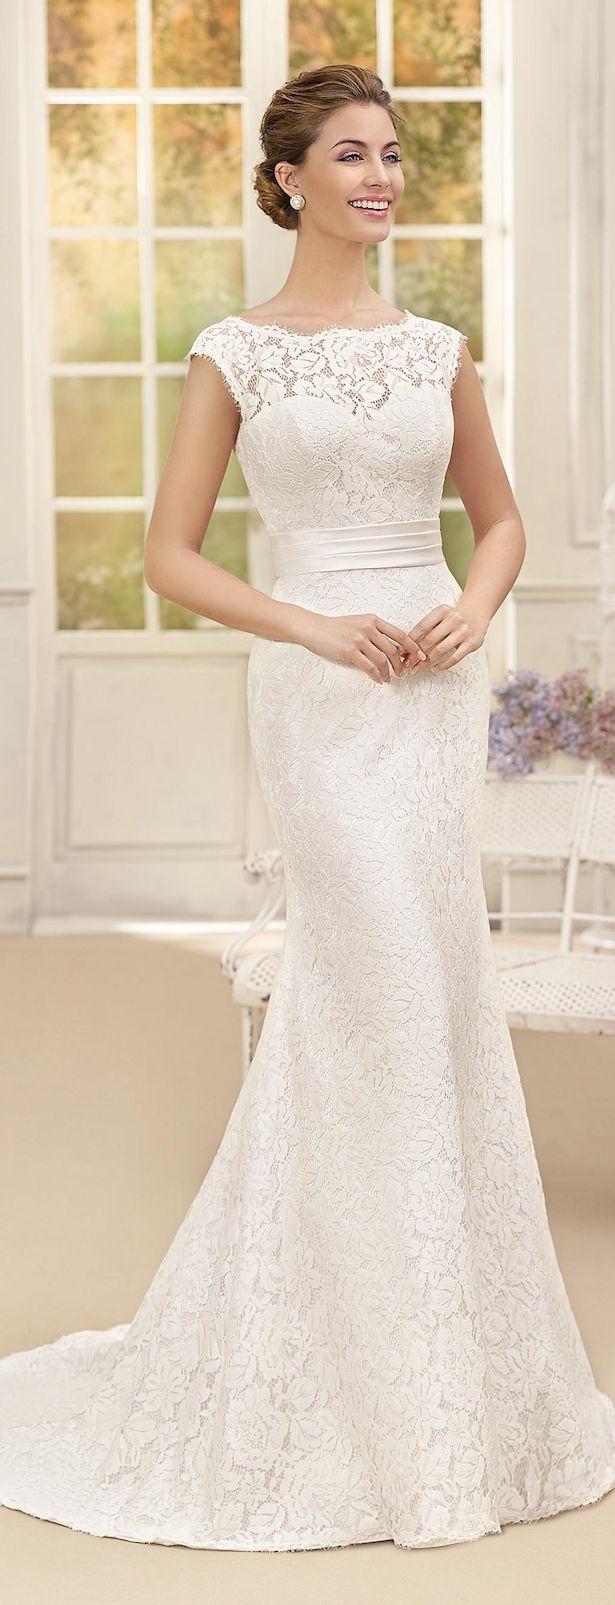 Unique style wedding dresses  Cool Menus Summer Style Wedding Dress by Fara Sposa  Bridal